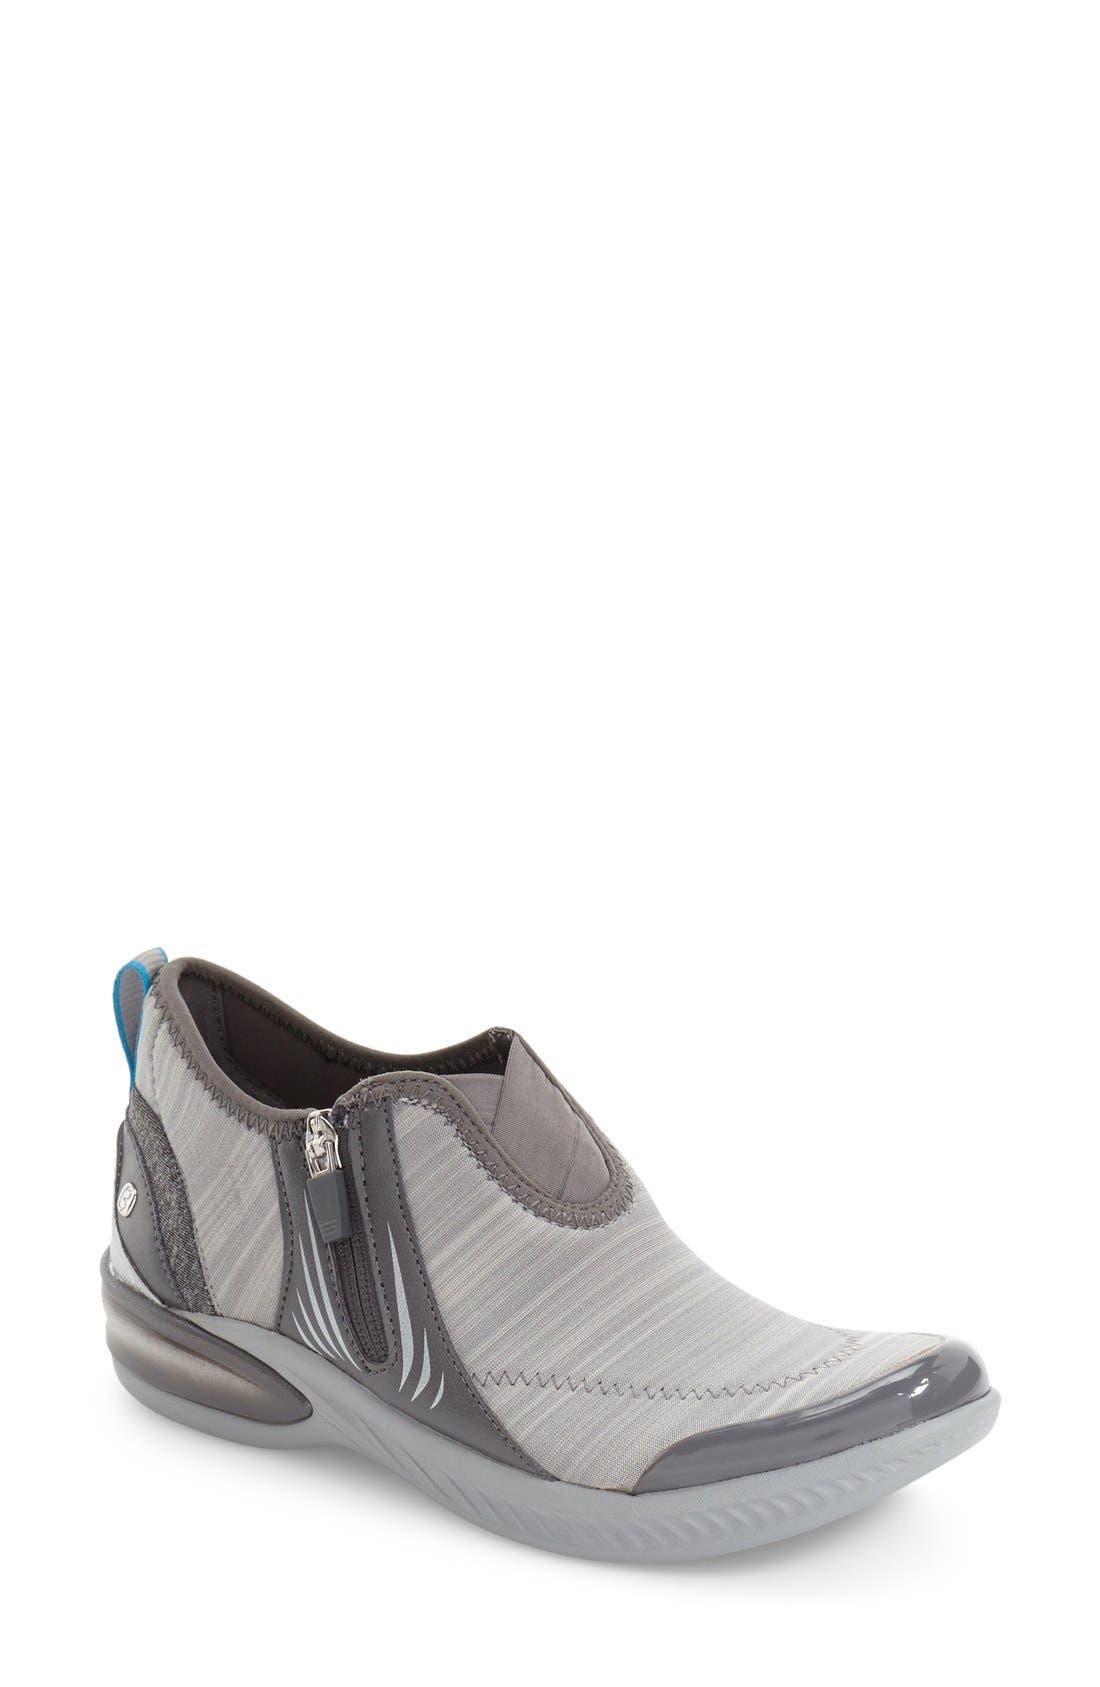 Main Image - BZees Nova Midi Sneaker (Women)